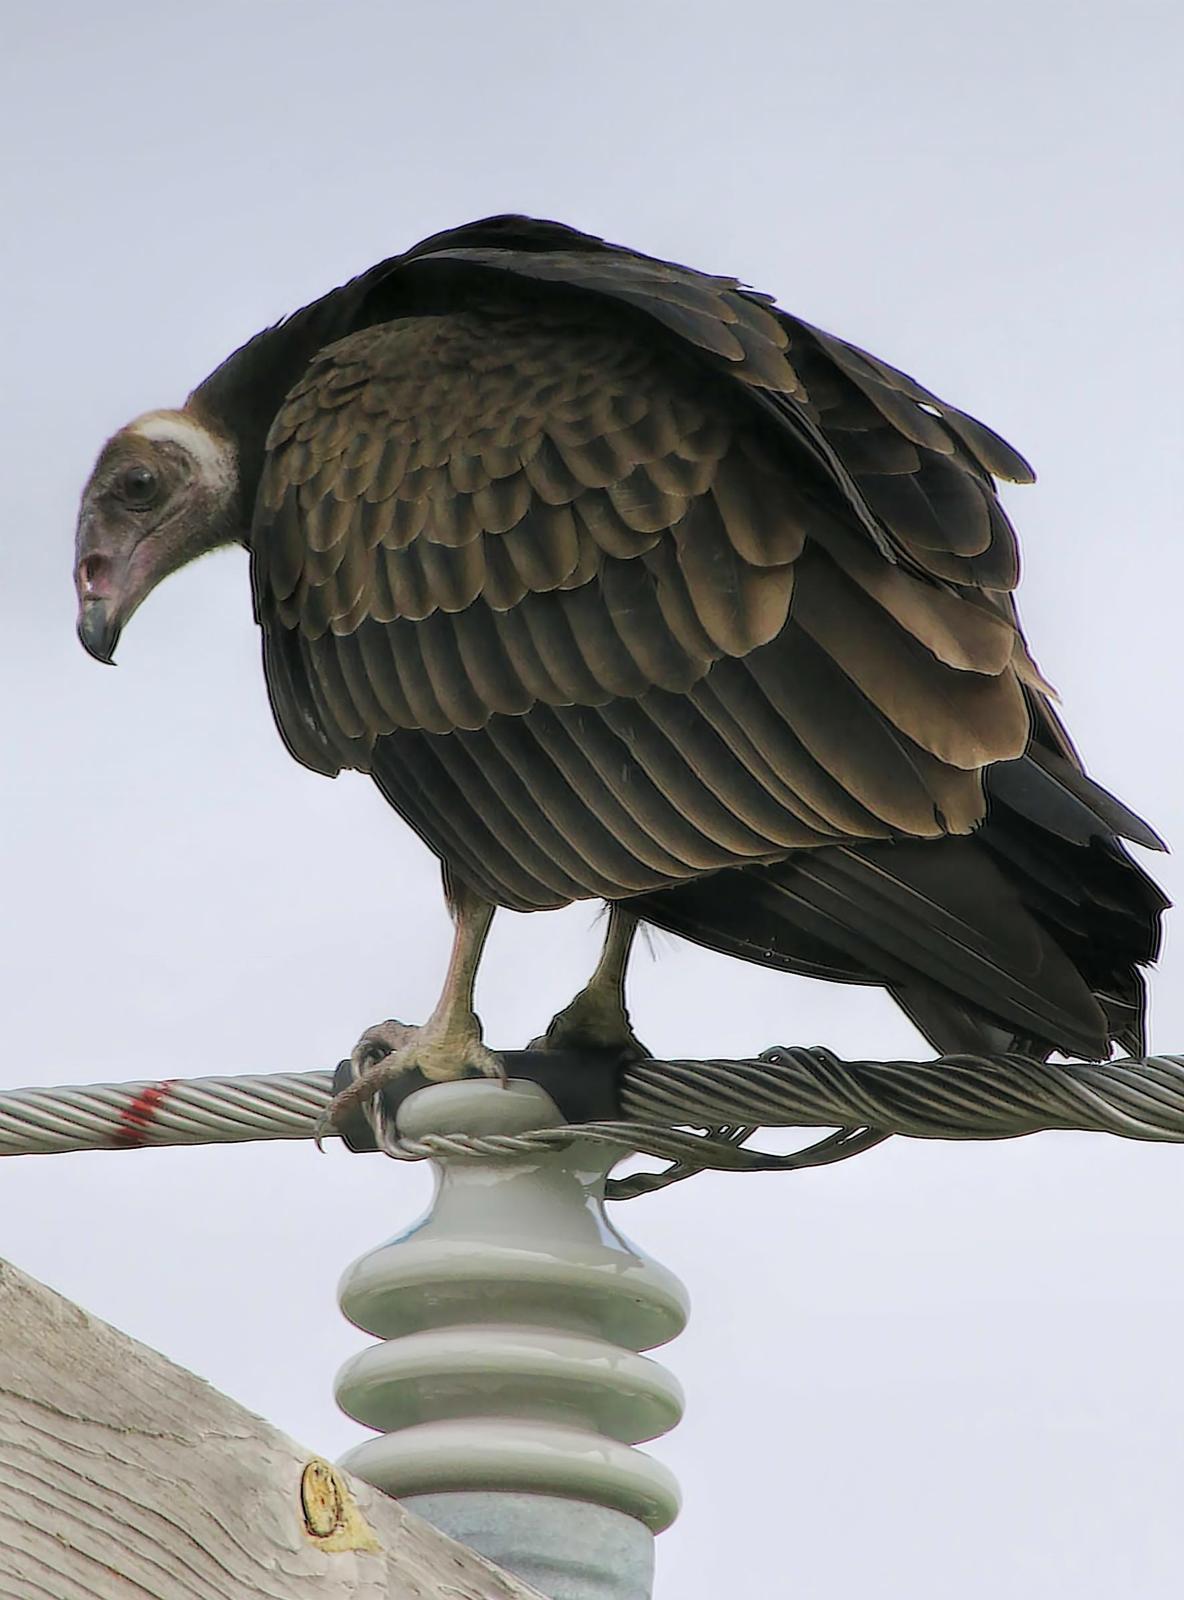 Turkey Vulture Photo by Dan Tallman